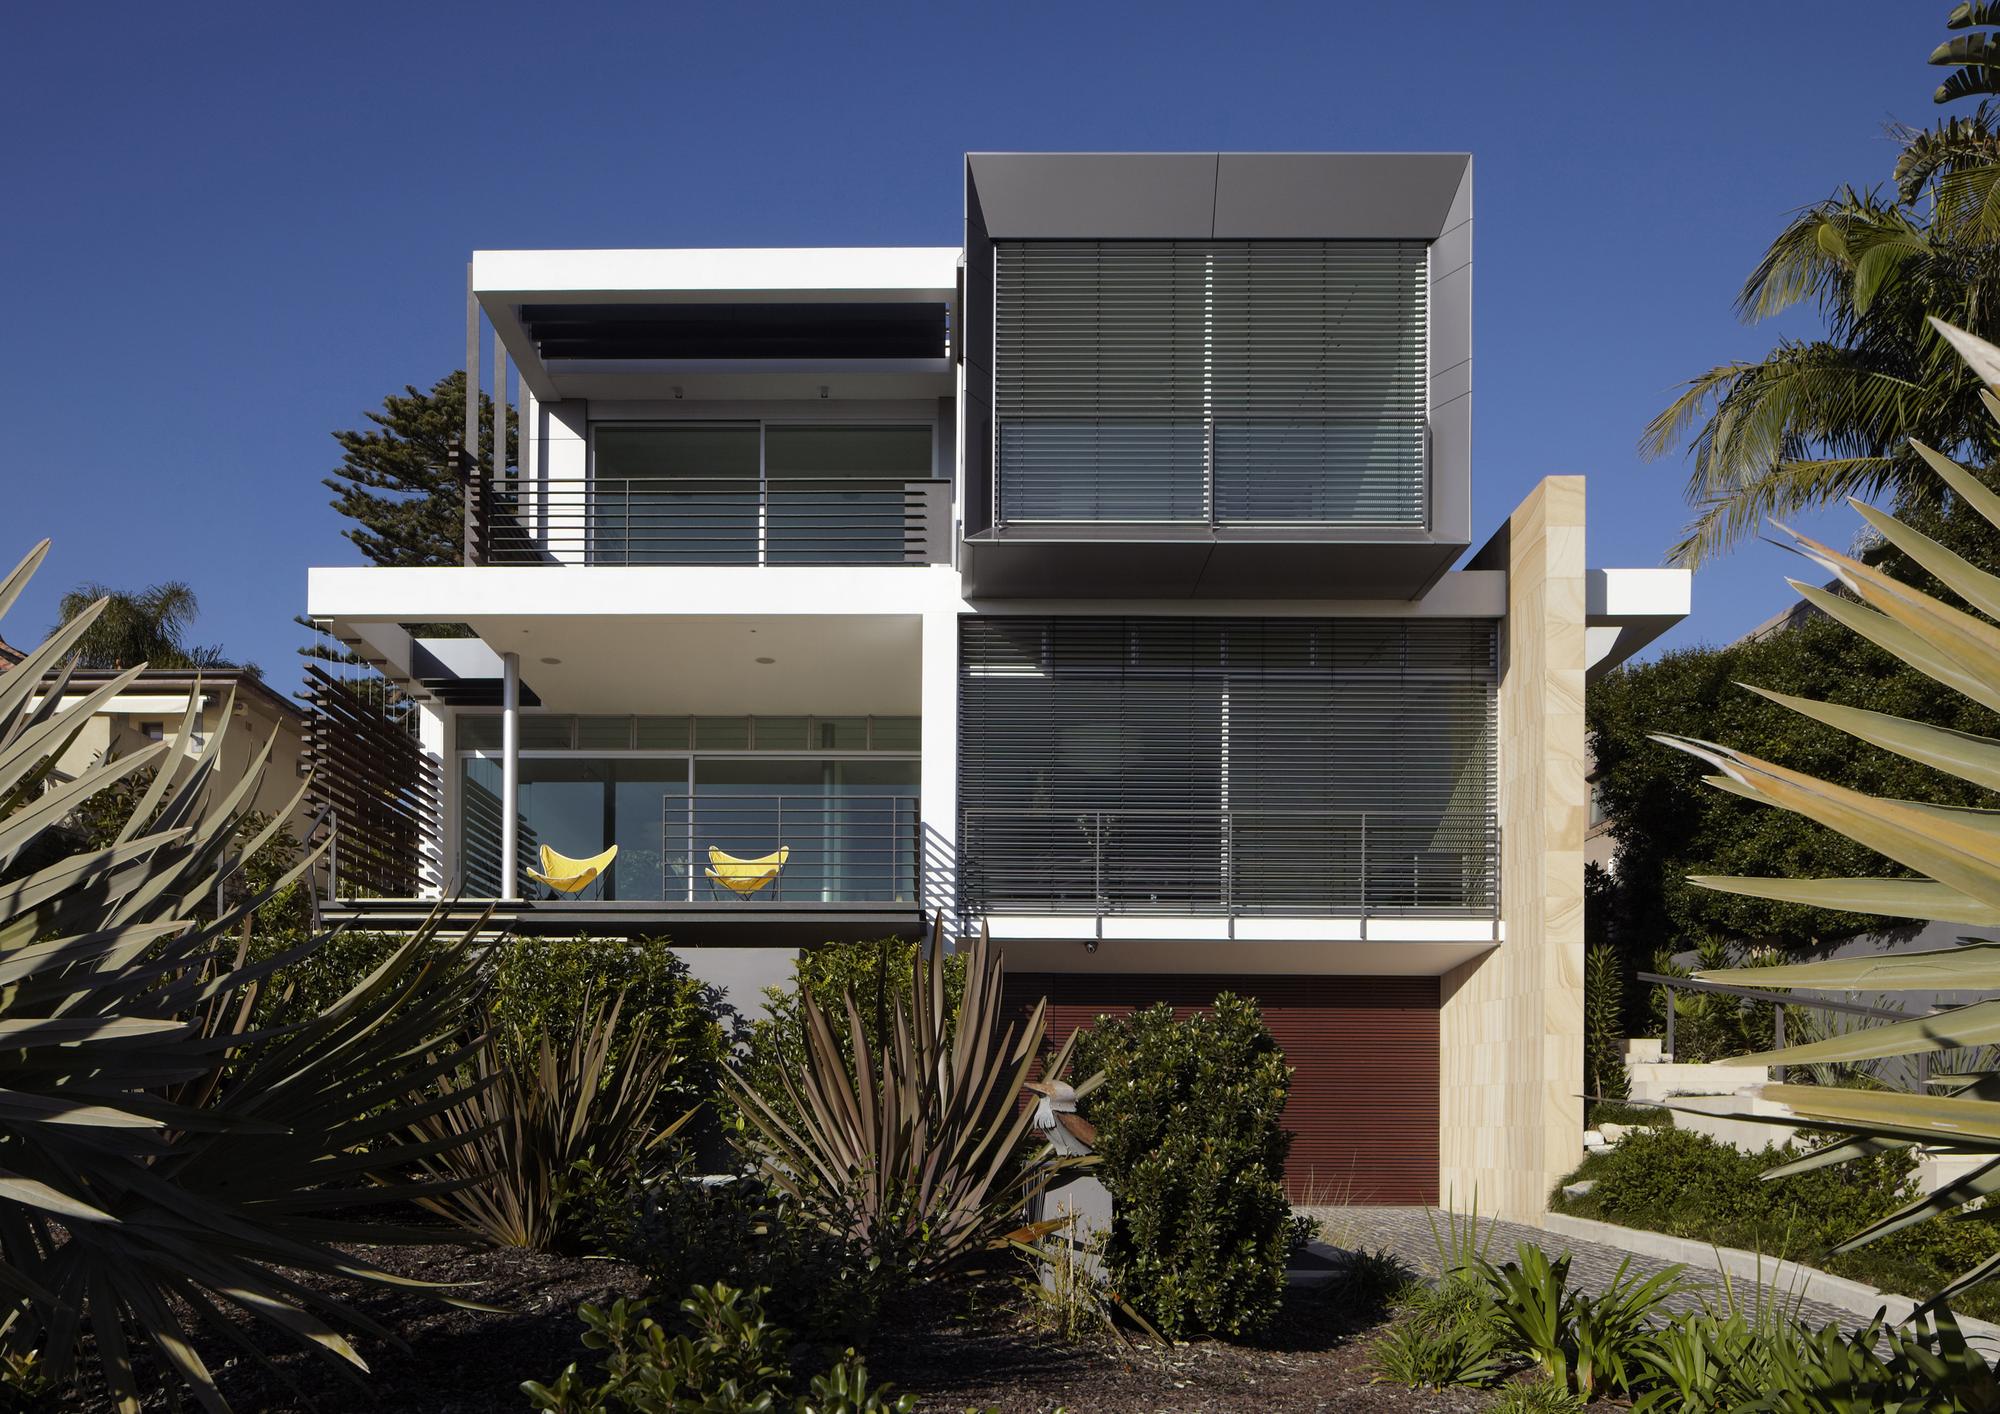 Wentworth Rd House / Edward Szewczyk Architects, © Justin Alexander